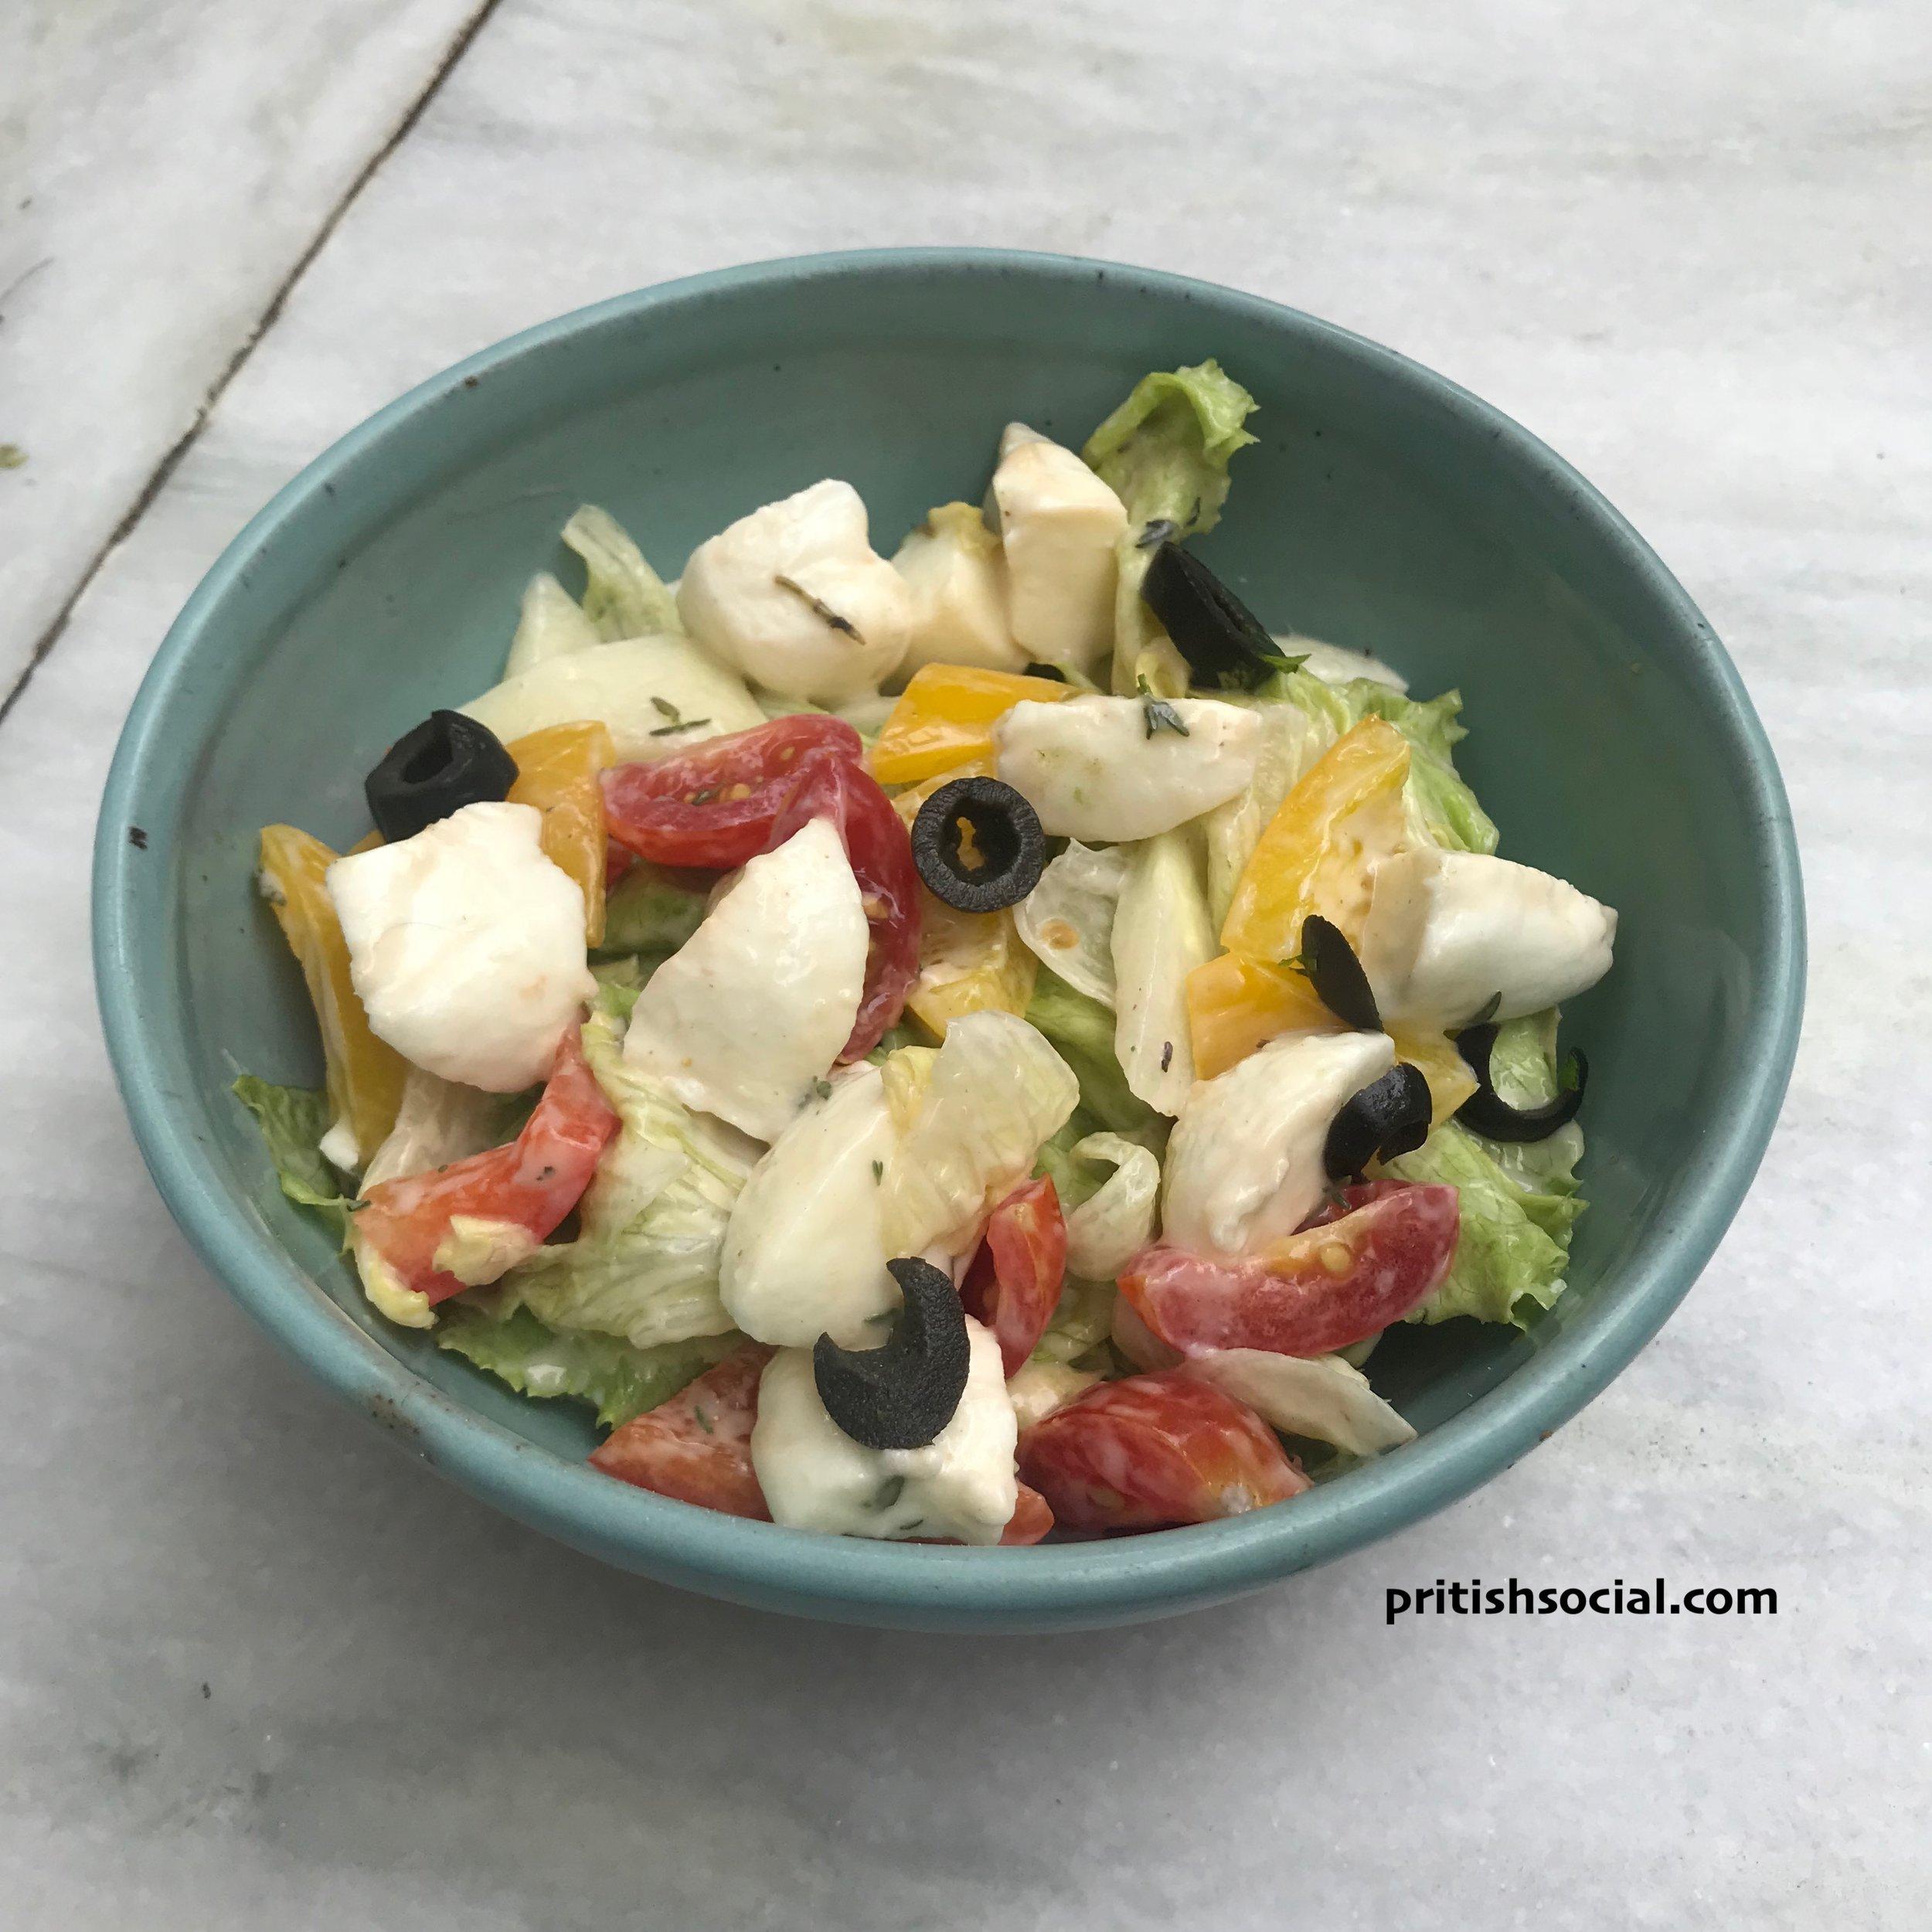 Veg Salad Roastery Coffee House PritishSocial.jpg